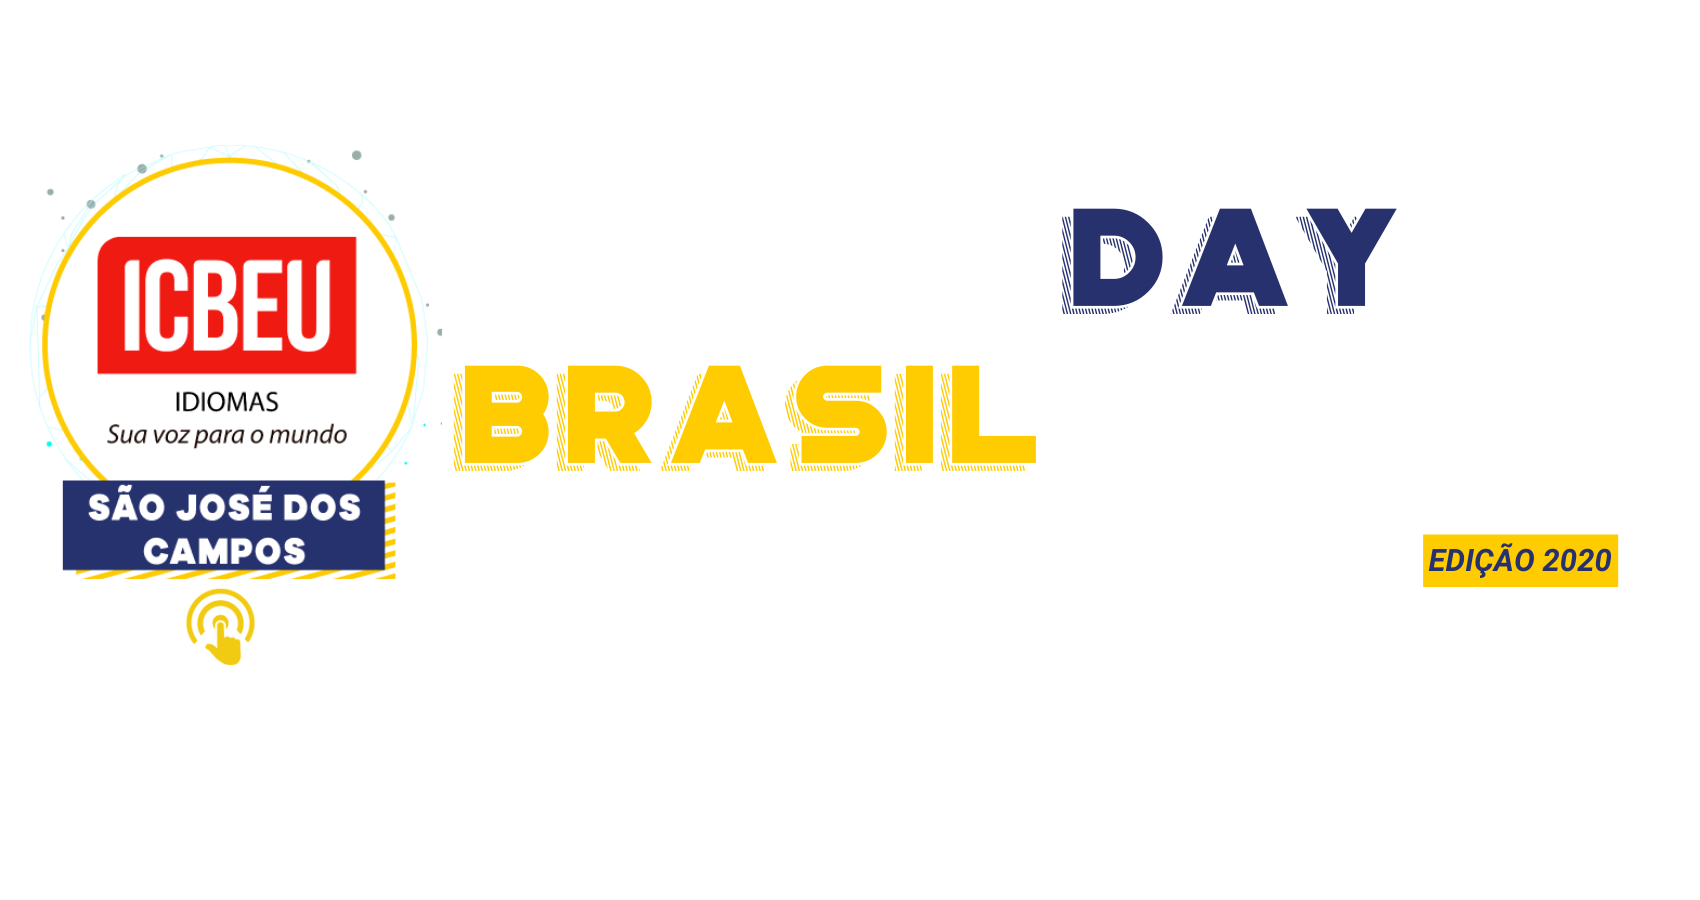 Maker Day Brasil Capa São José dos Campos